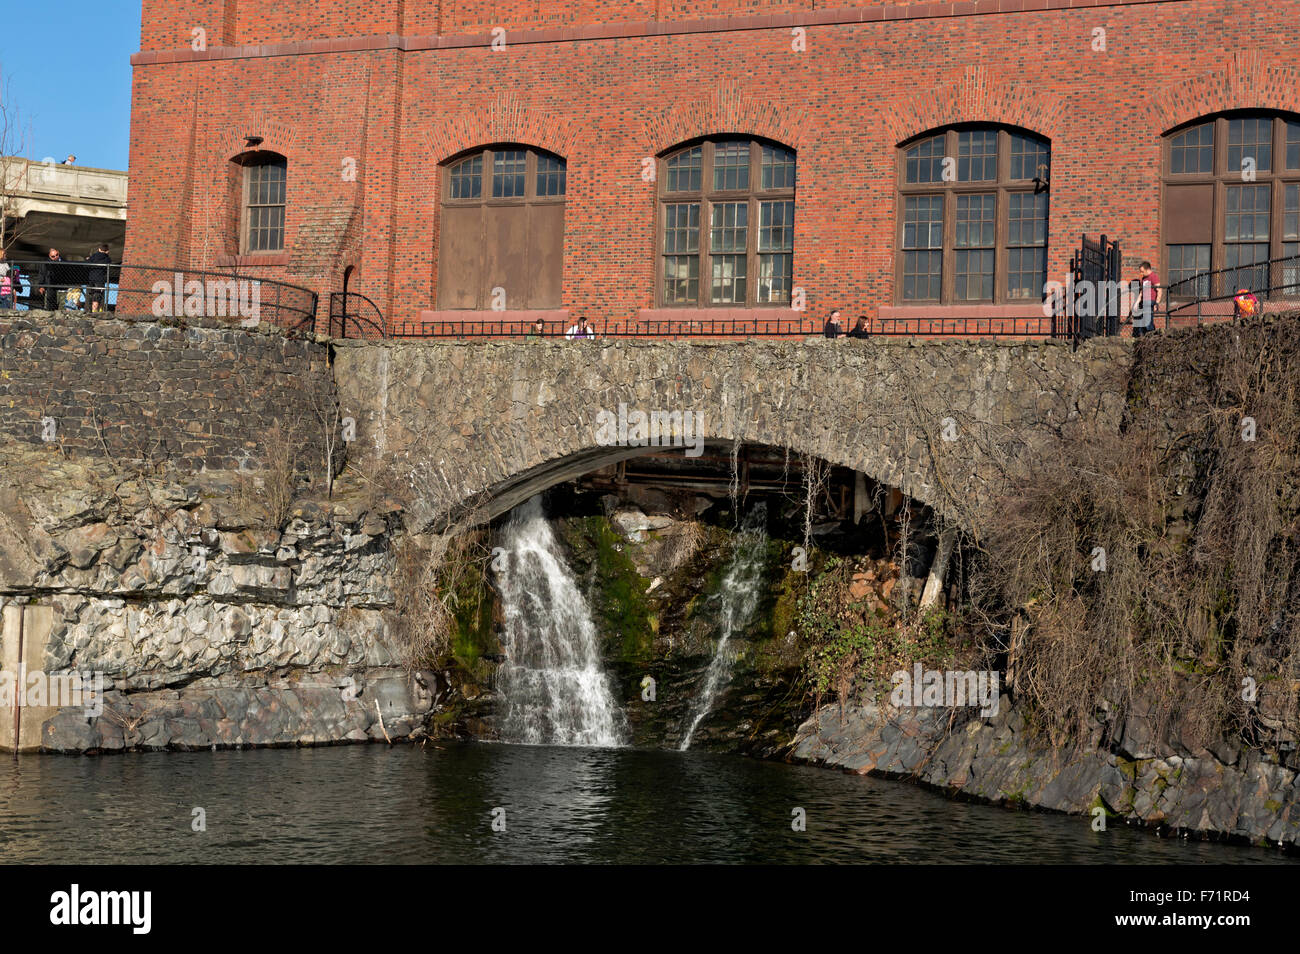 WASHINGTON - A waterfall below the Washington Water Powerplant from Huntington Park at Spokane Falls in downtown - Stock Image